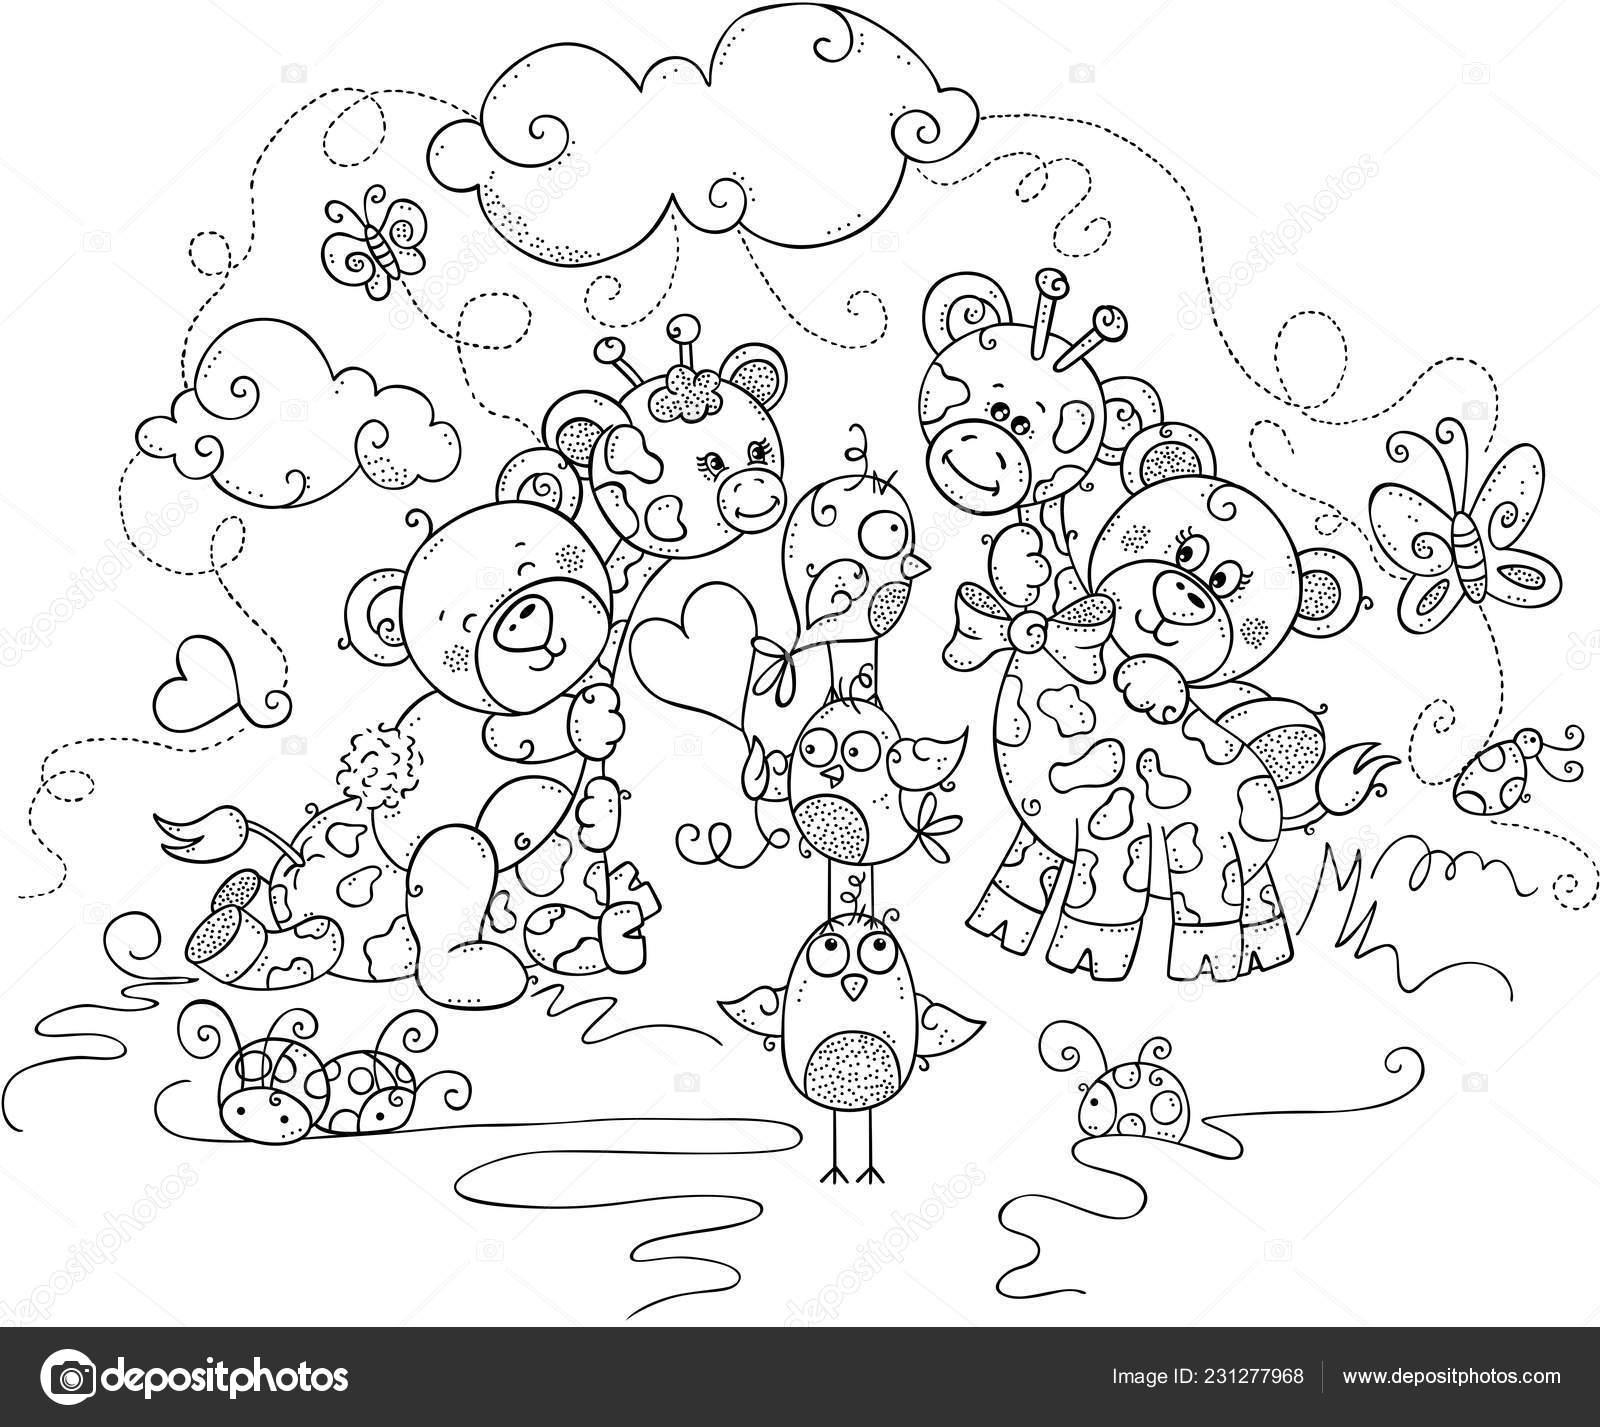 Kids Coloring Page Cute Teddy Bears Giraffes Stock Vector C Socris79 231277968